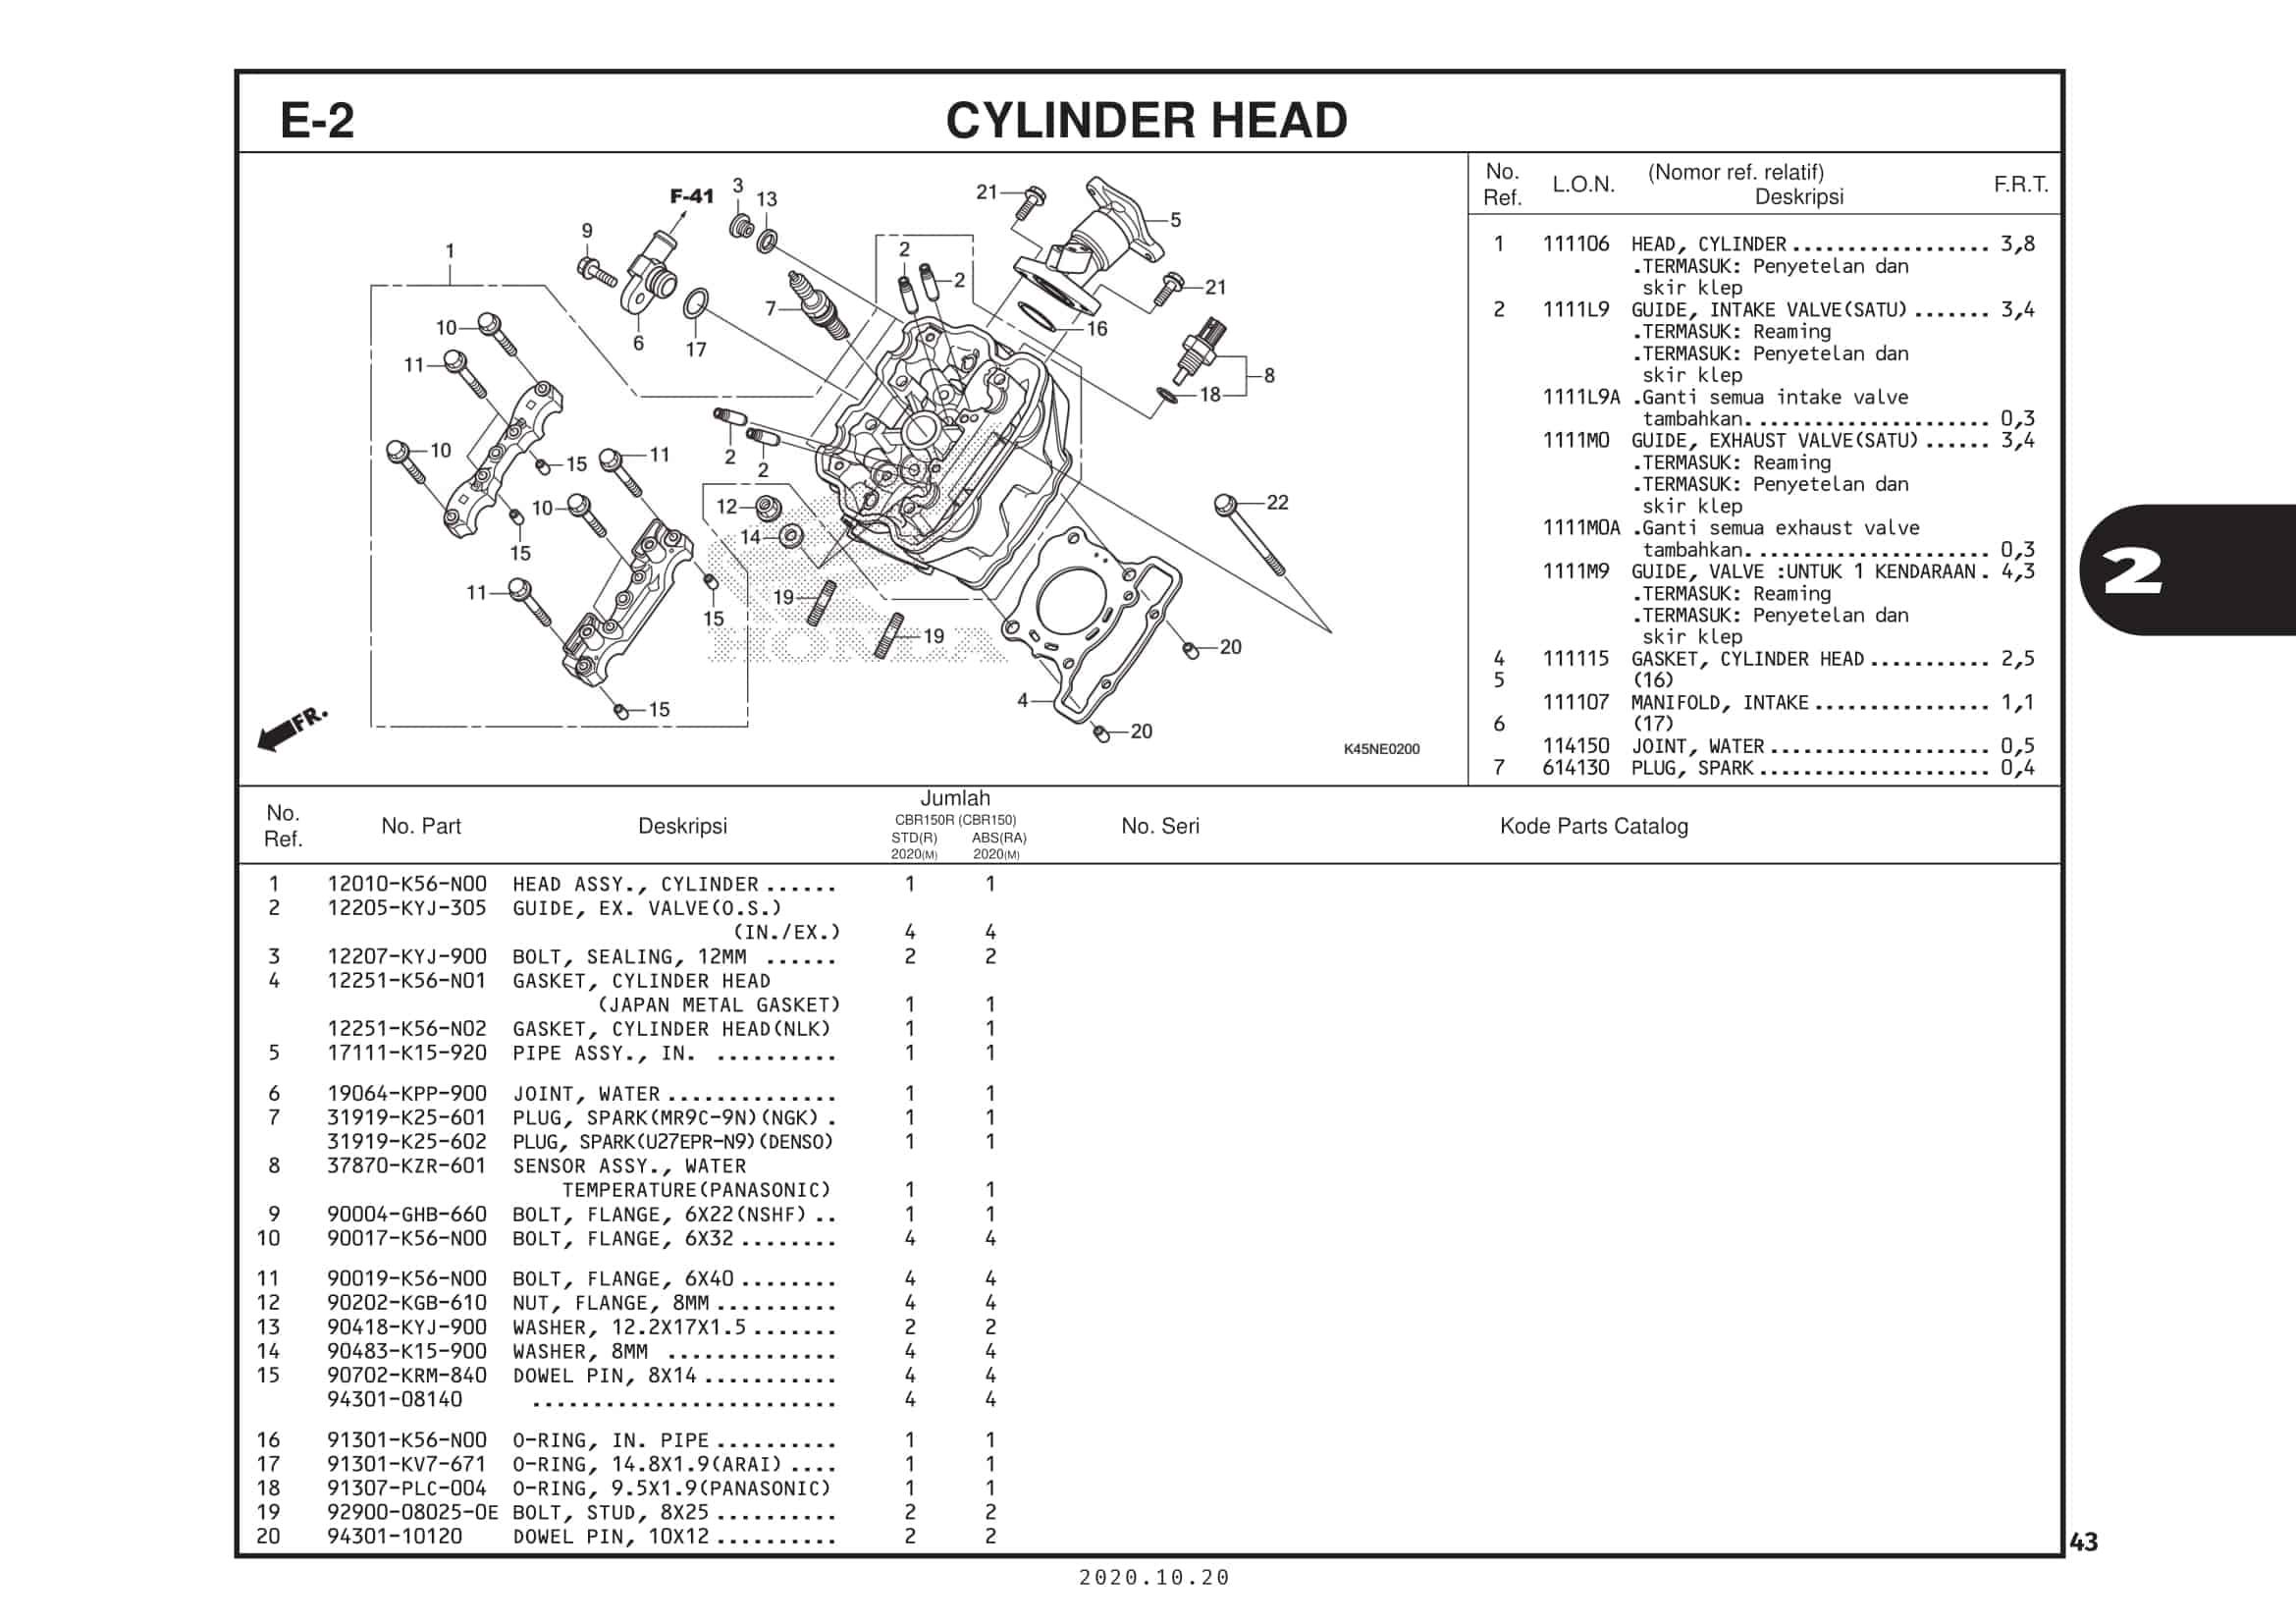 E-2 Cylinder Head